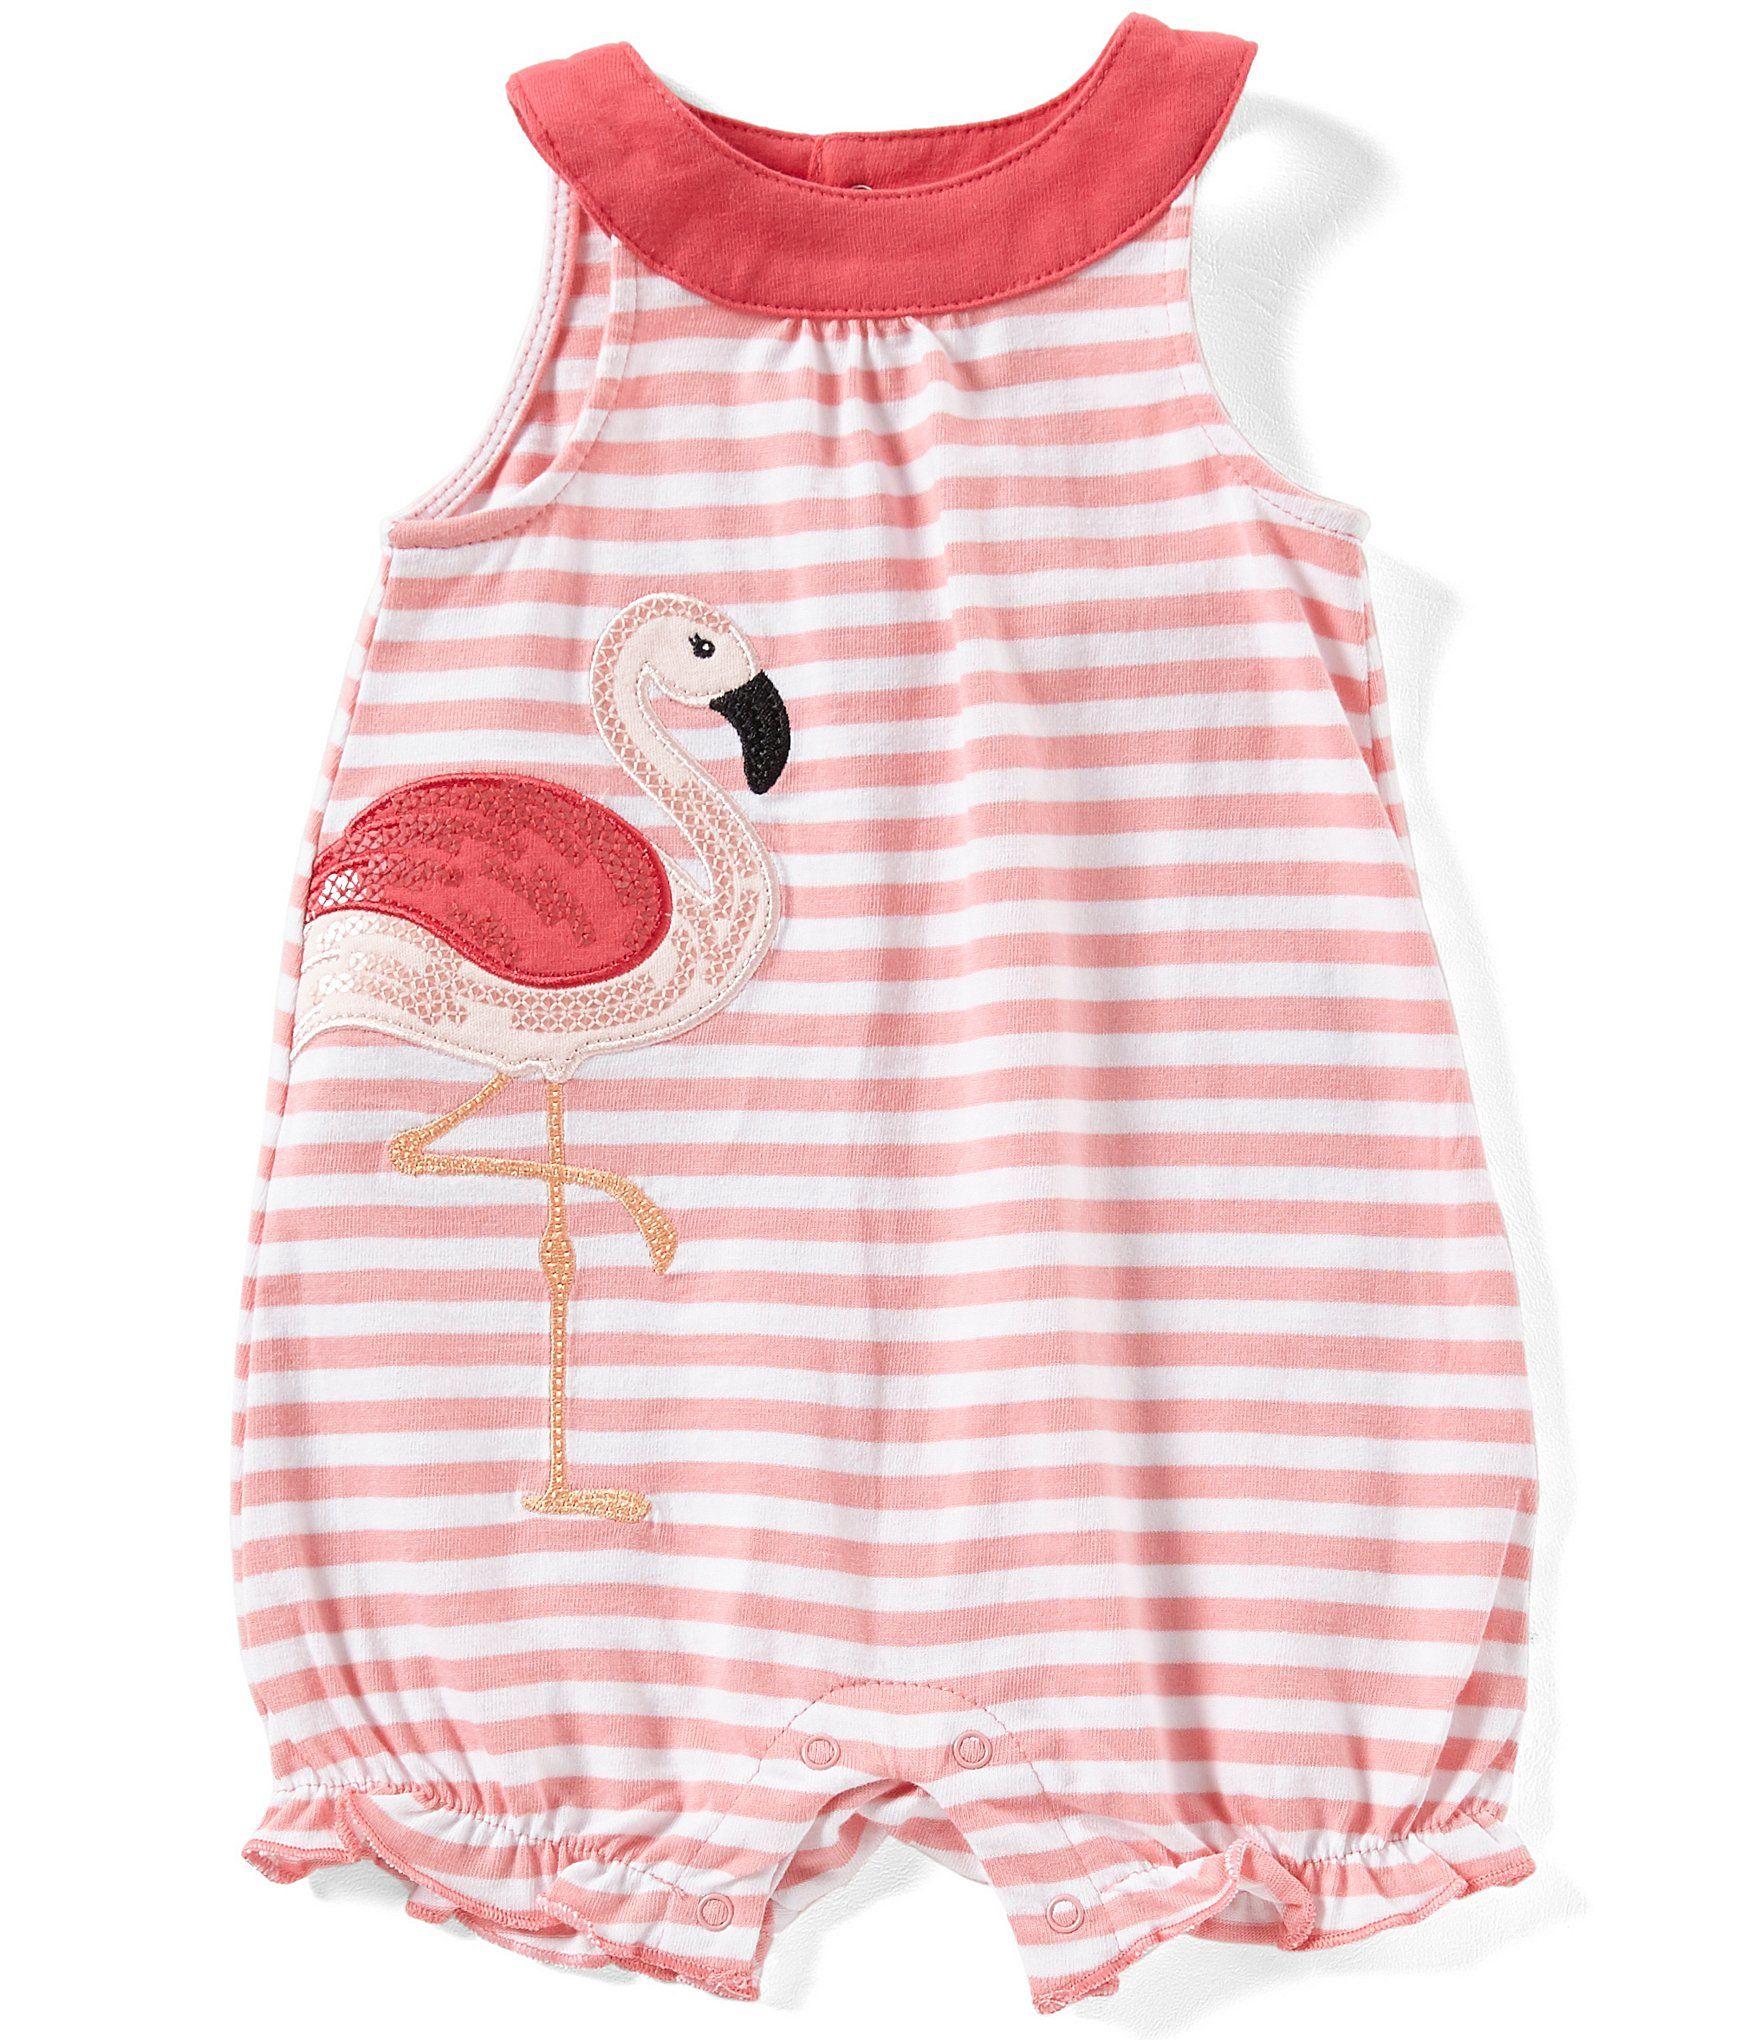 43d021c41bd7 Shop for Starting Out Baby Girls Newborn-9 Months Flamingo Applique Romper  at Dillards.